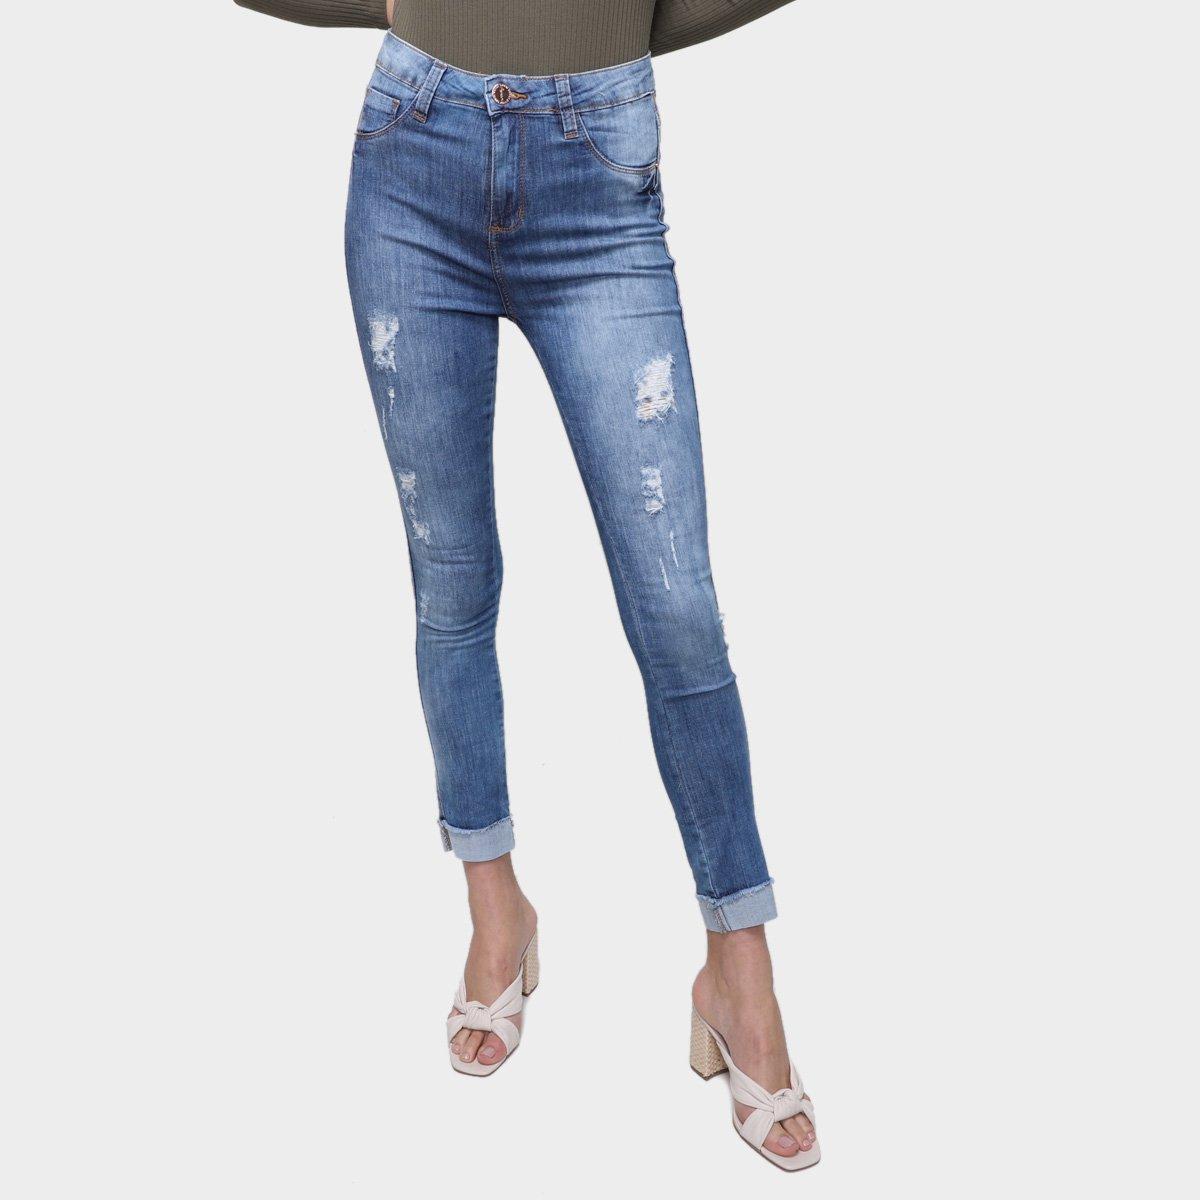 Calça Jeans Skinny Exco BSC TM6 B28 Cintura Alta Feminina